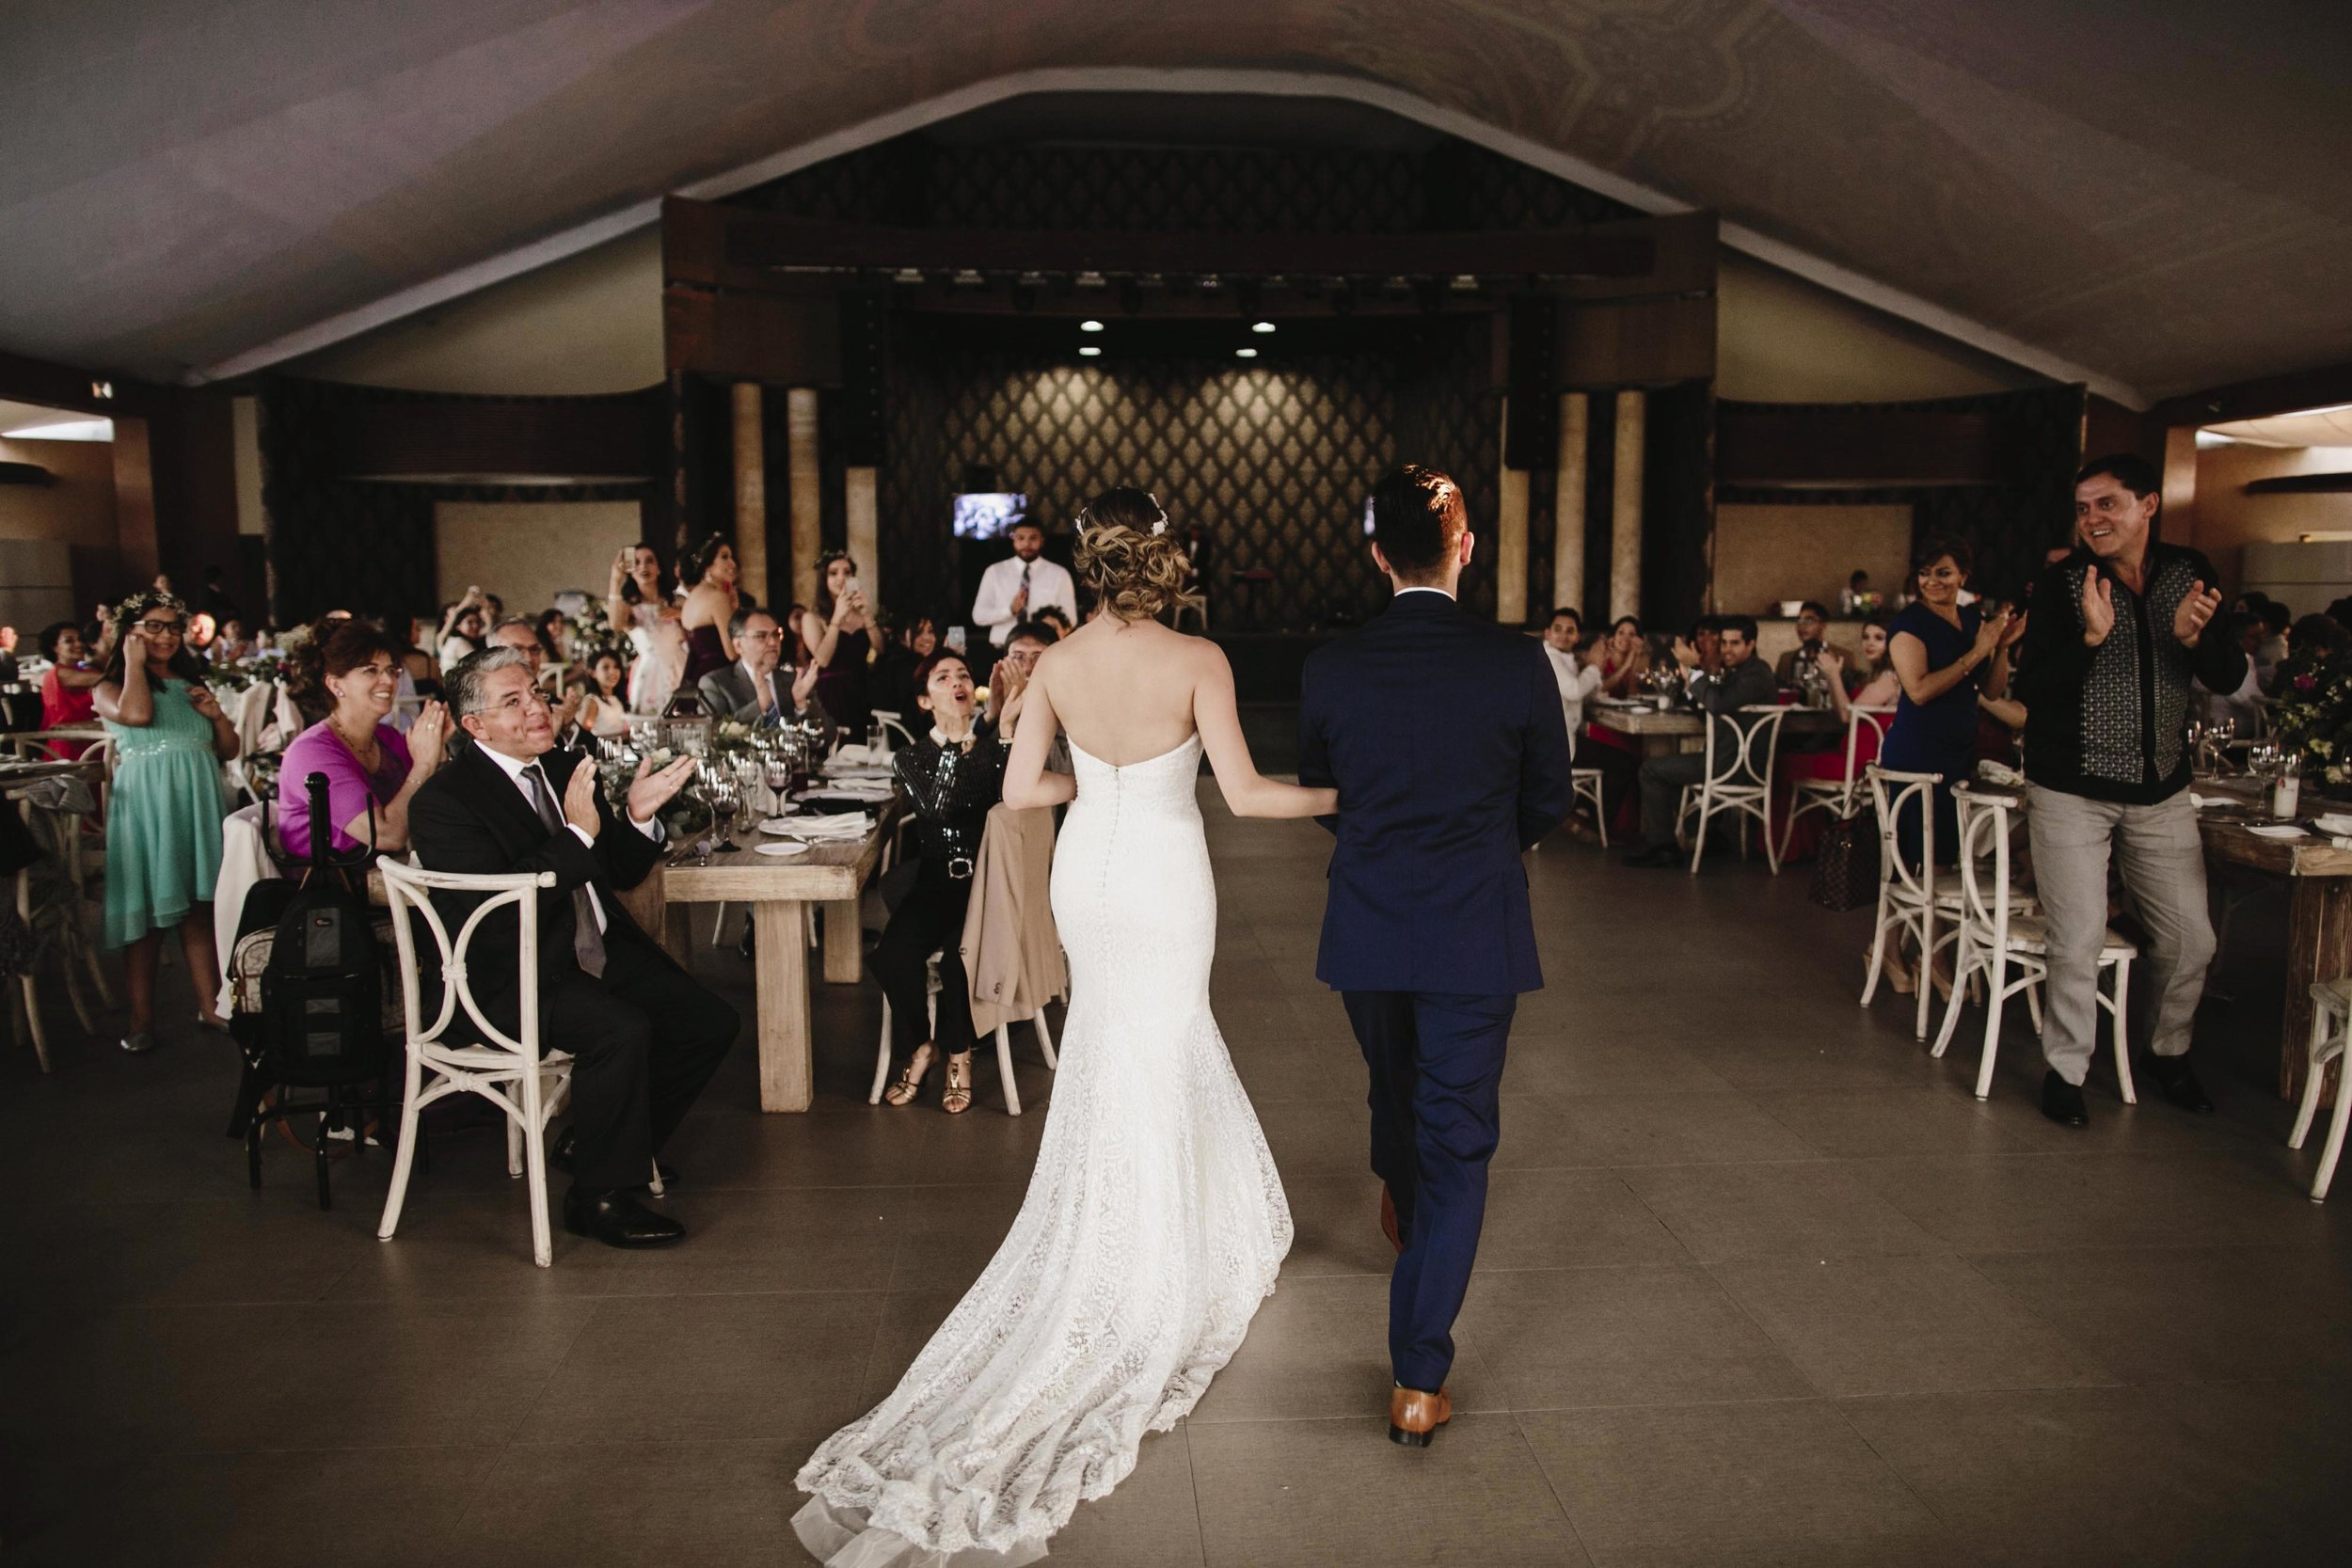 alfonso_flores_destination_wedding_photography_jardin_amarello_cuernavaca63.jpg